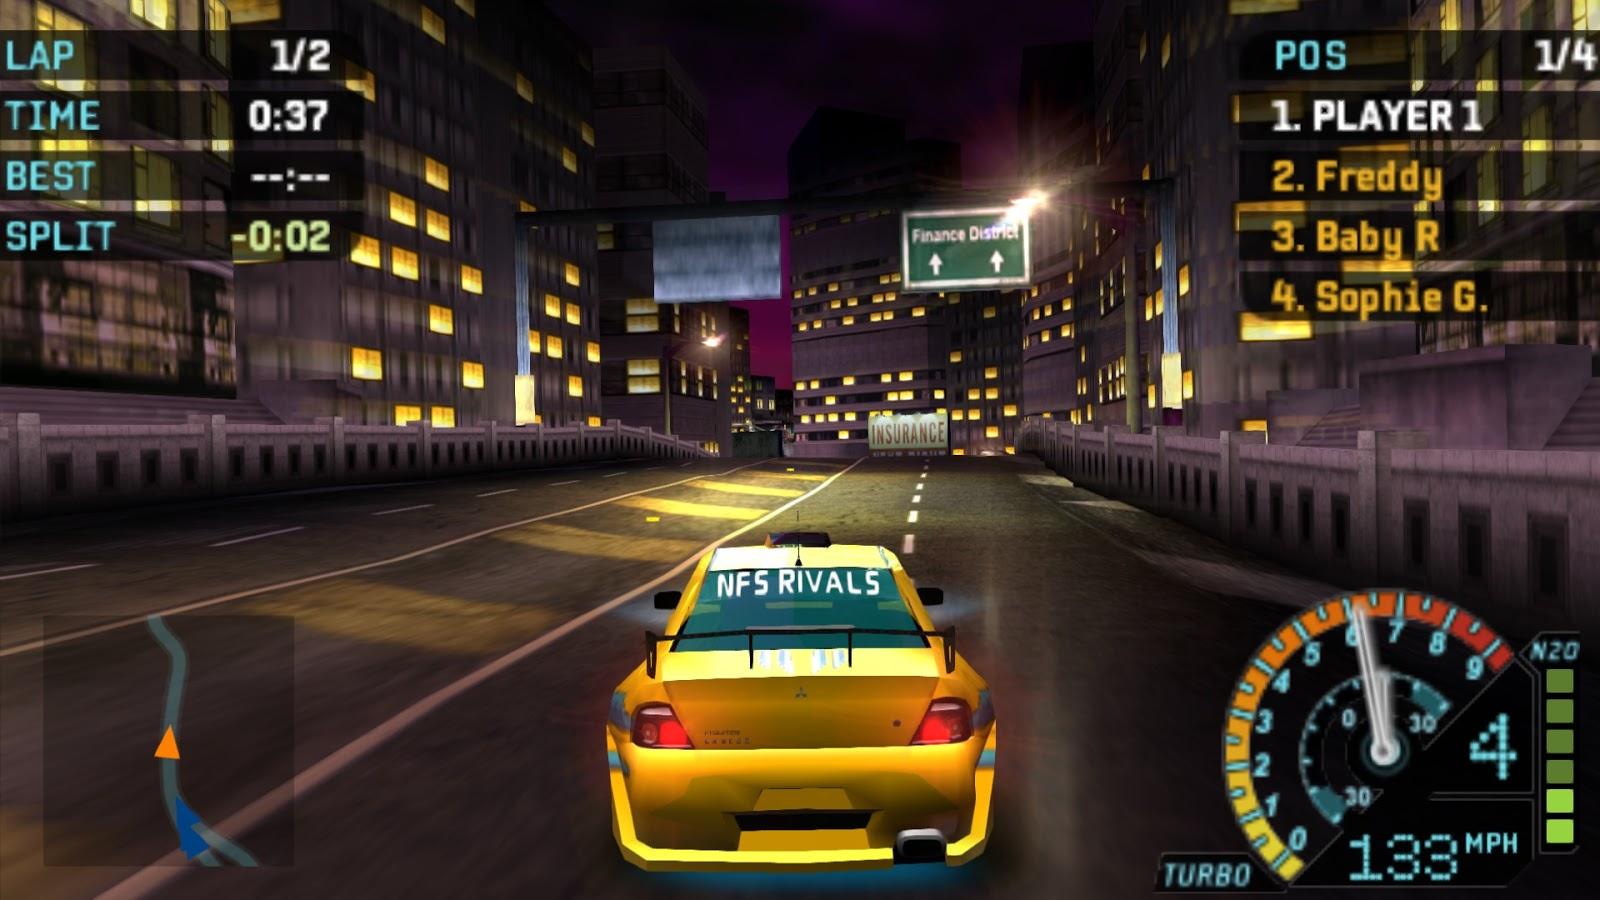 Need for speed underground 3 release date in Australia